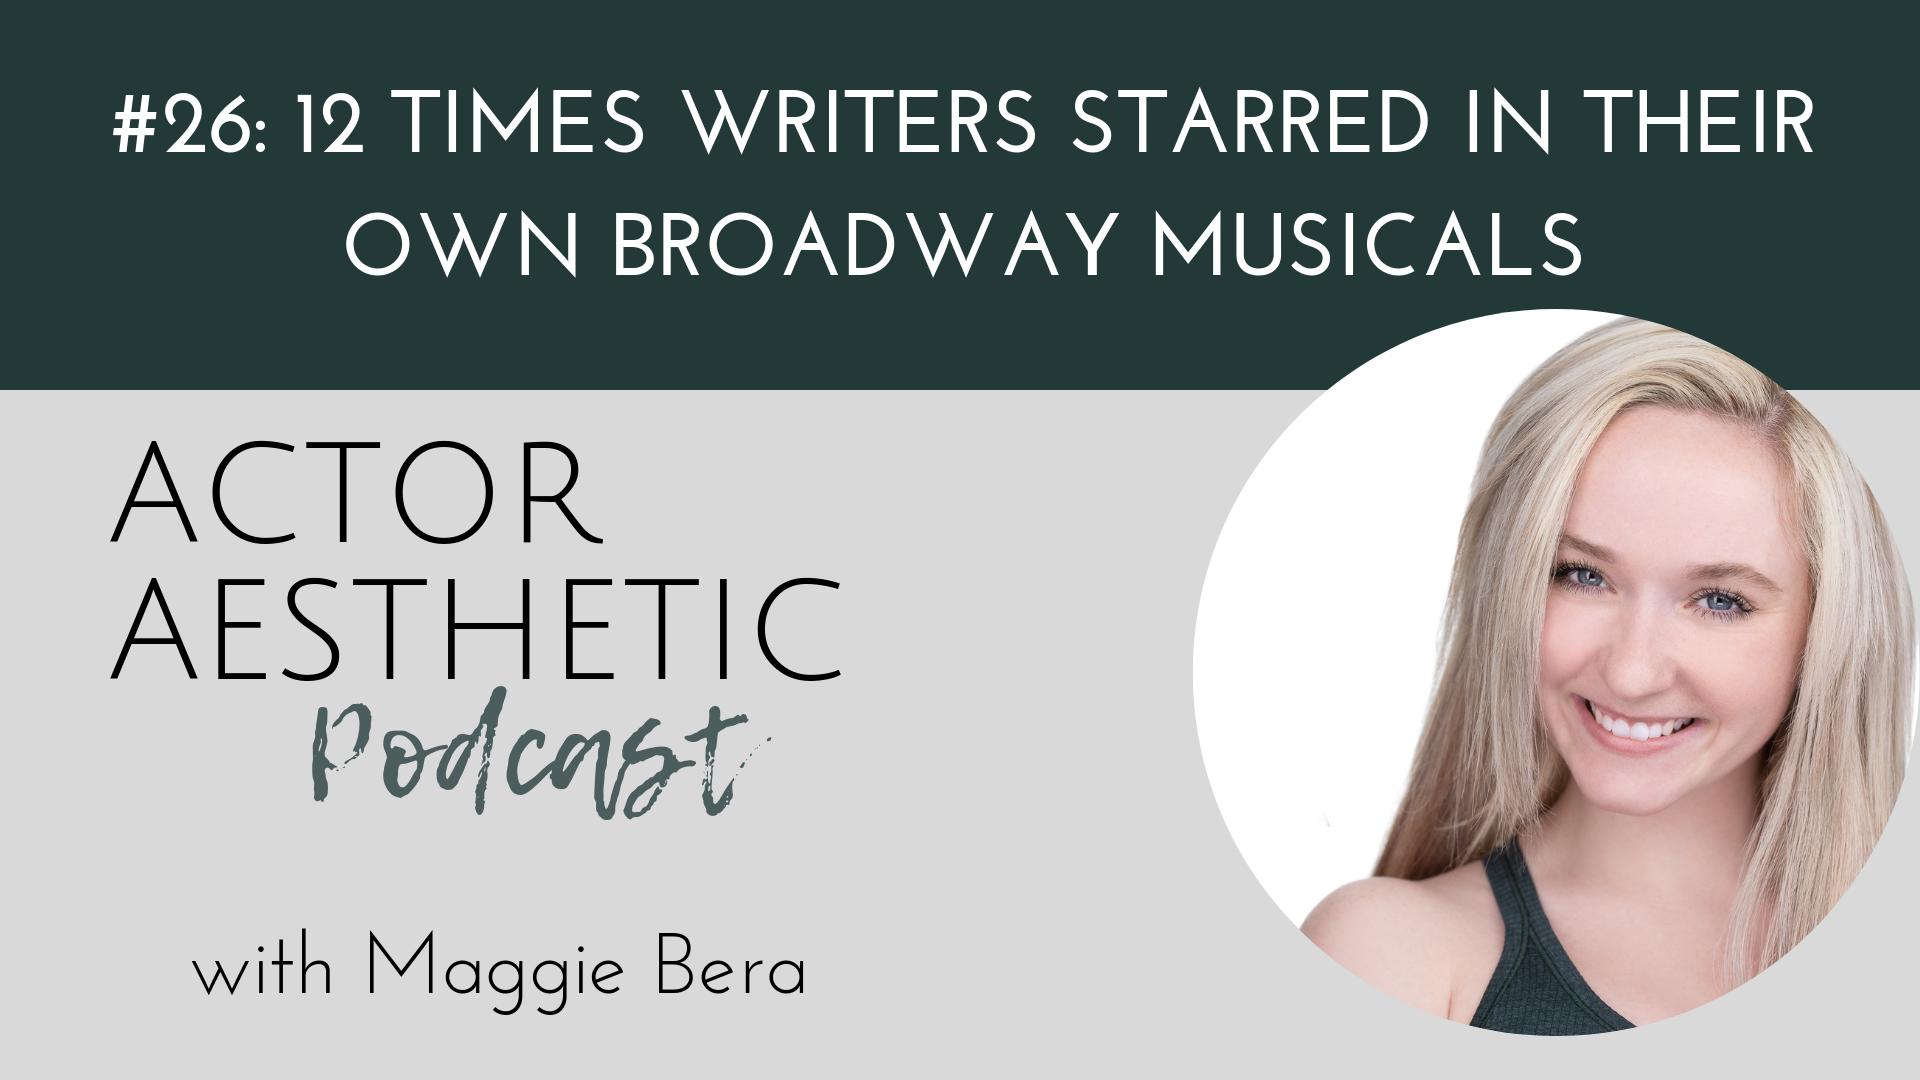 Broadway Writer Starring Own Musical